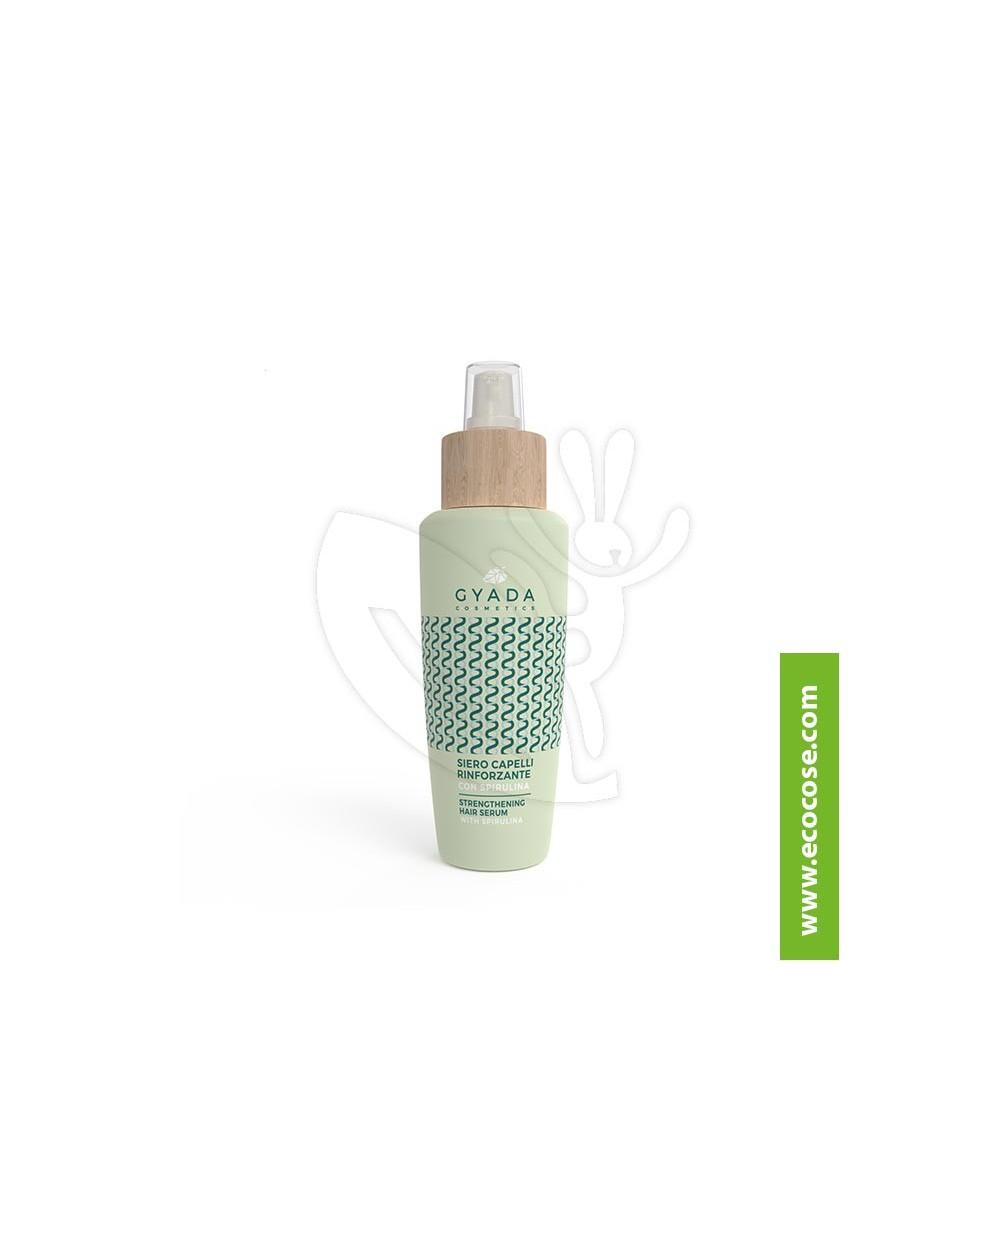 Gyada Cosmetics - Siero capelli rinforzante con spirulina